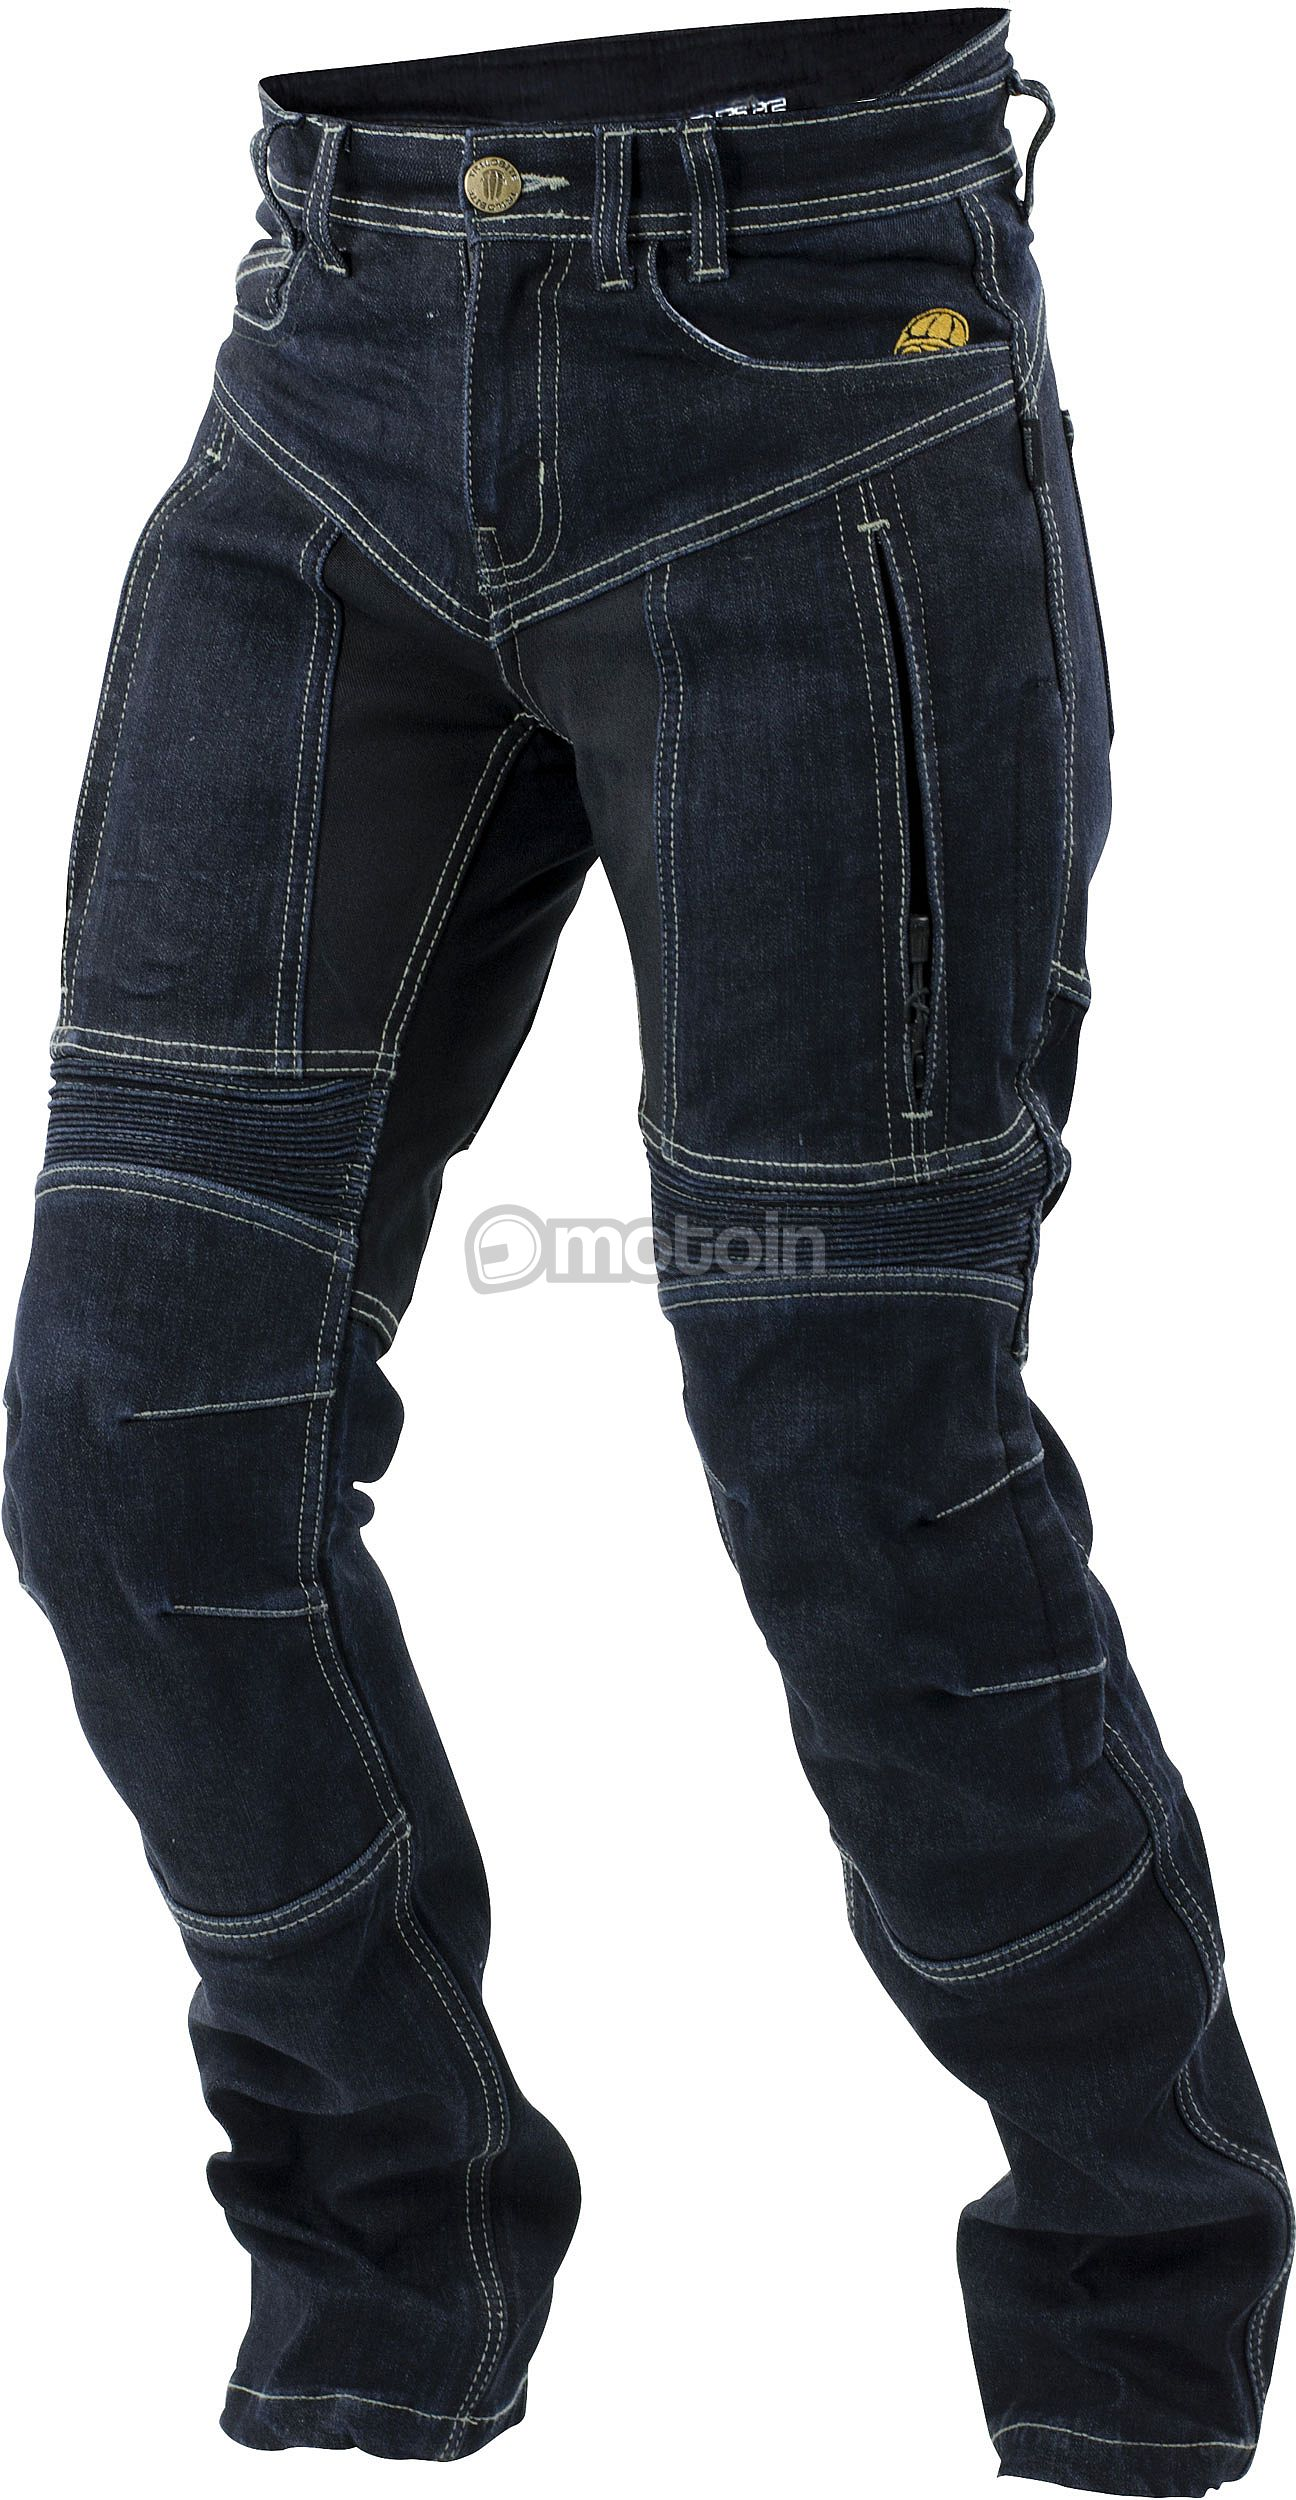 trilobite agnox kevlar jeans wasserdichte frauen. Black Bedroom Furniture Sets. Home Design Ideas